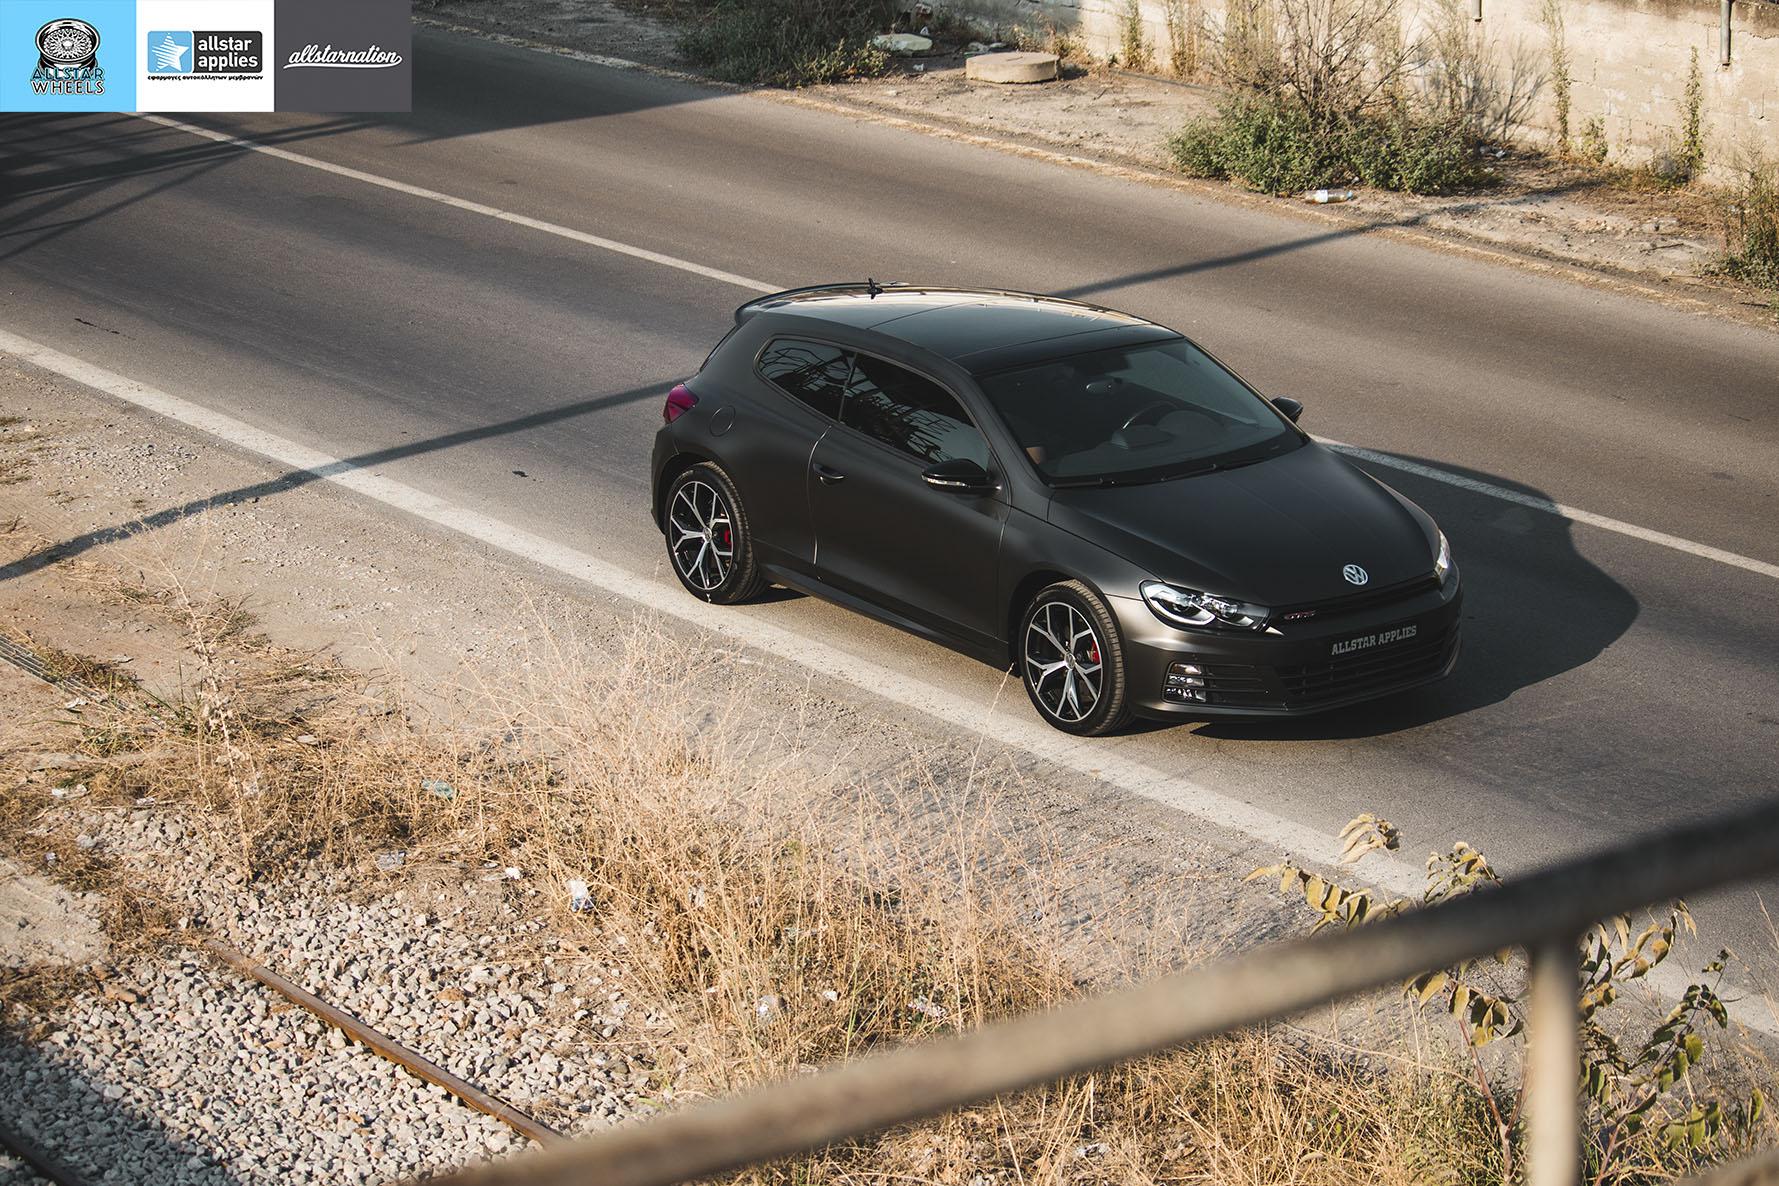 VW SCIROCCO MATT DIAMOND BLACK ALLSTAR APPLIES (14)